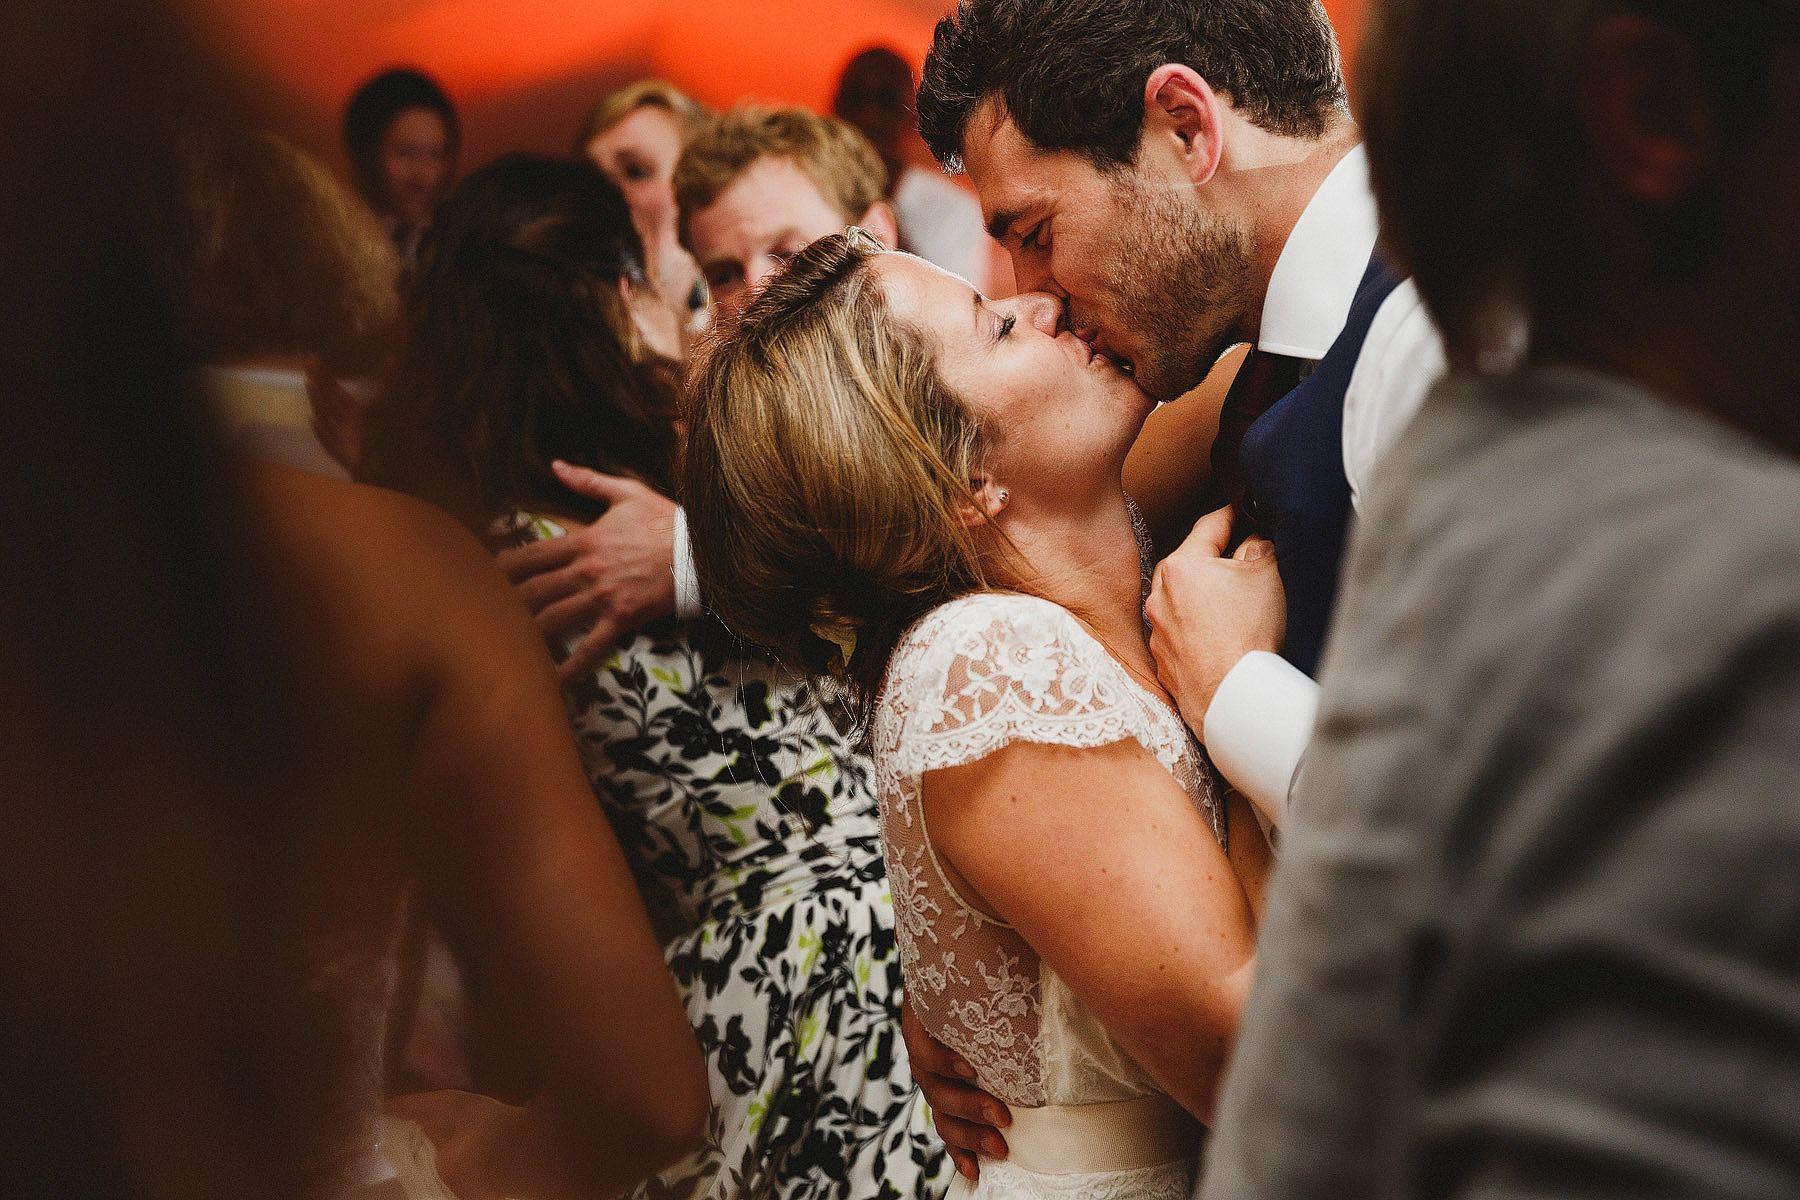 kissing on the dancefloor at a wedding